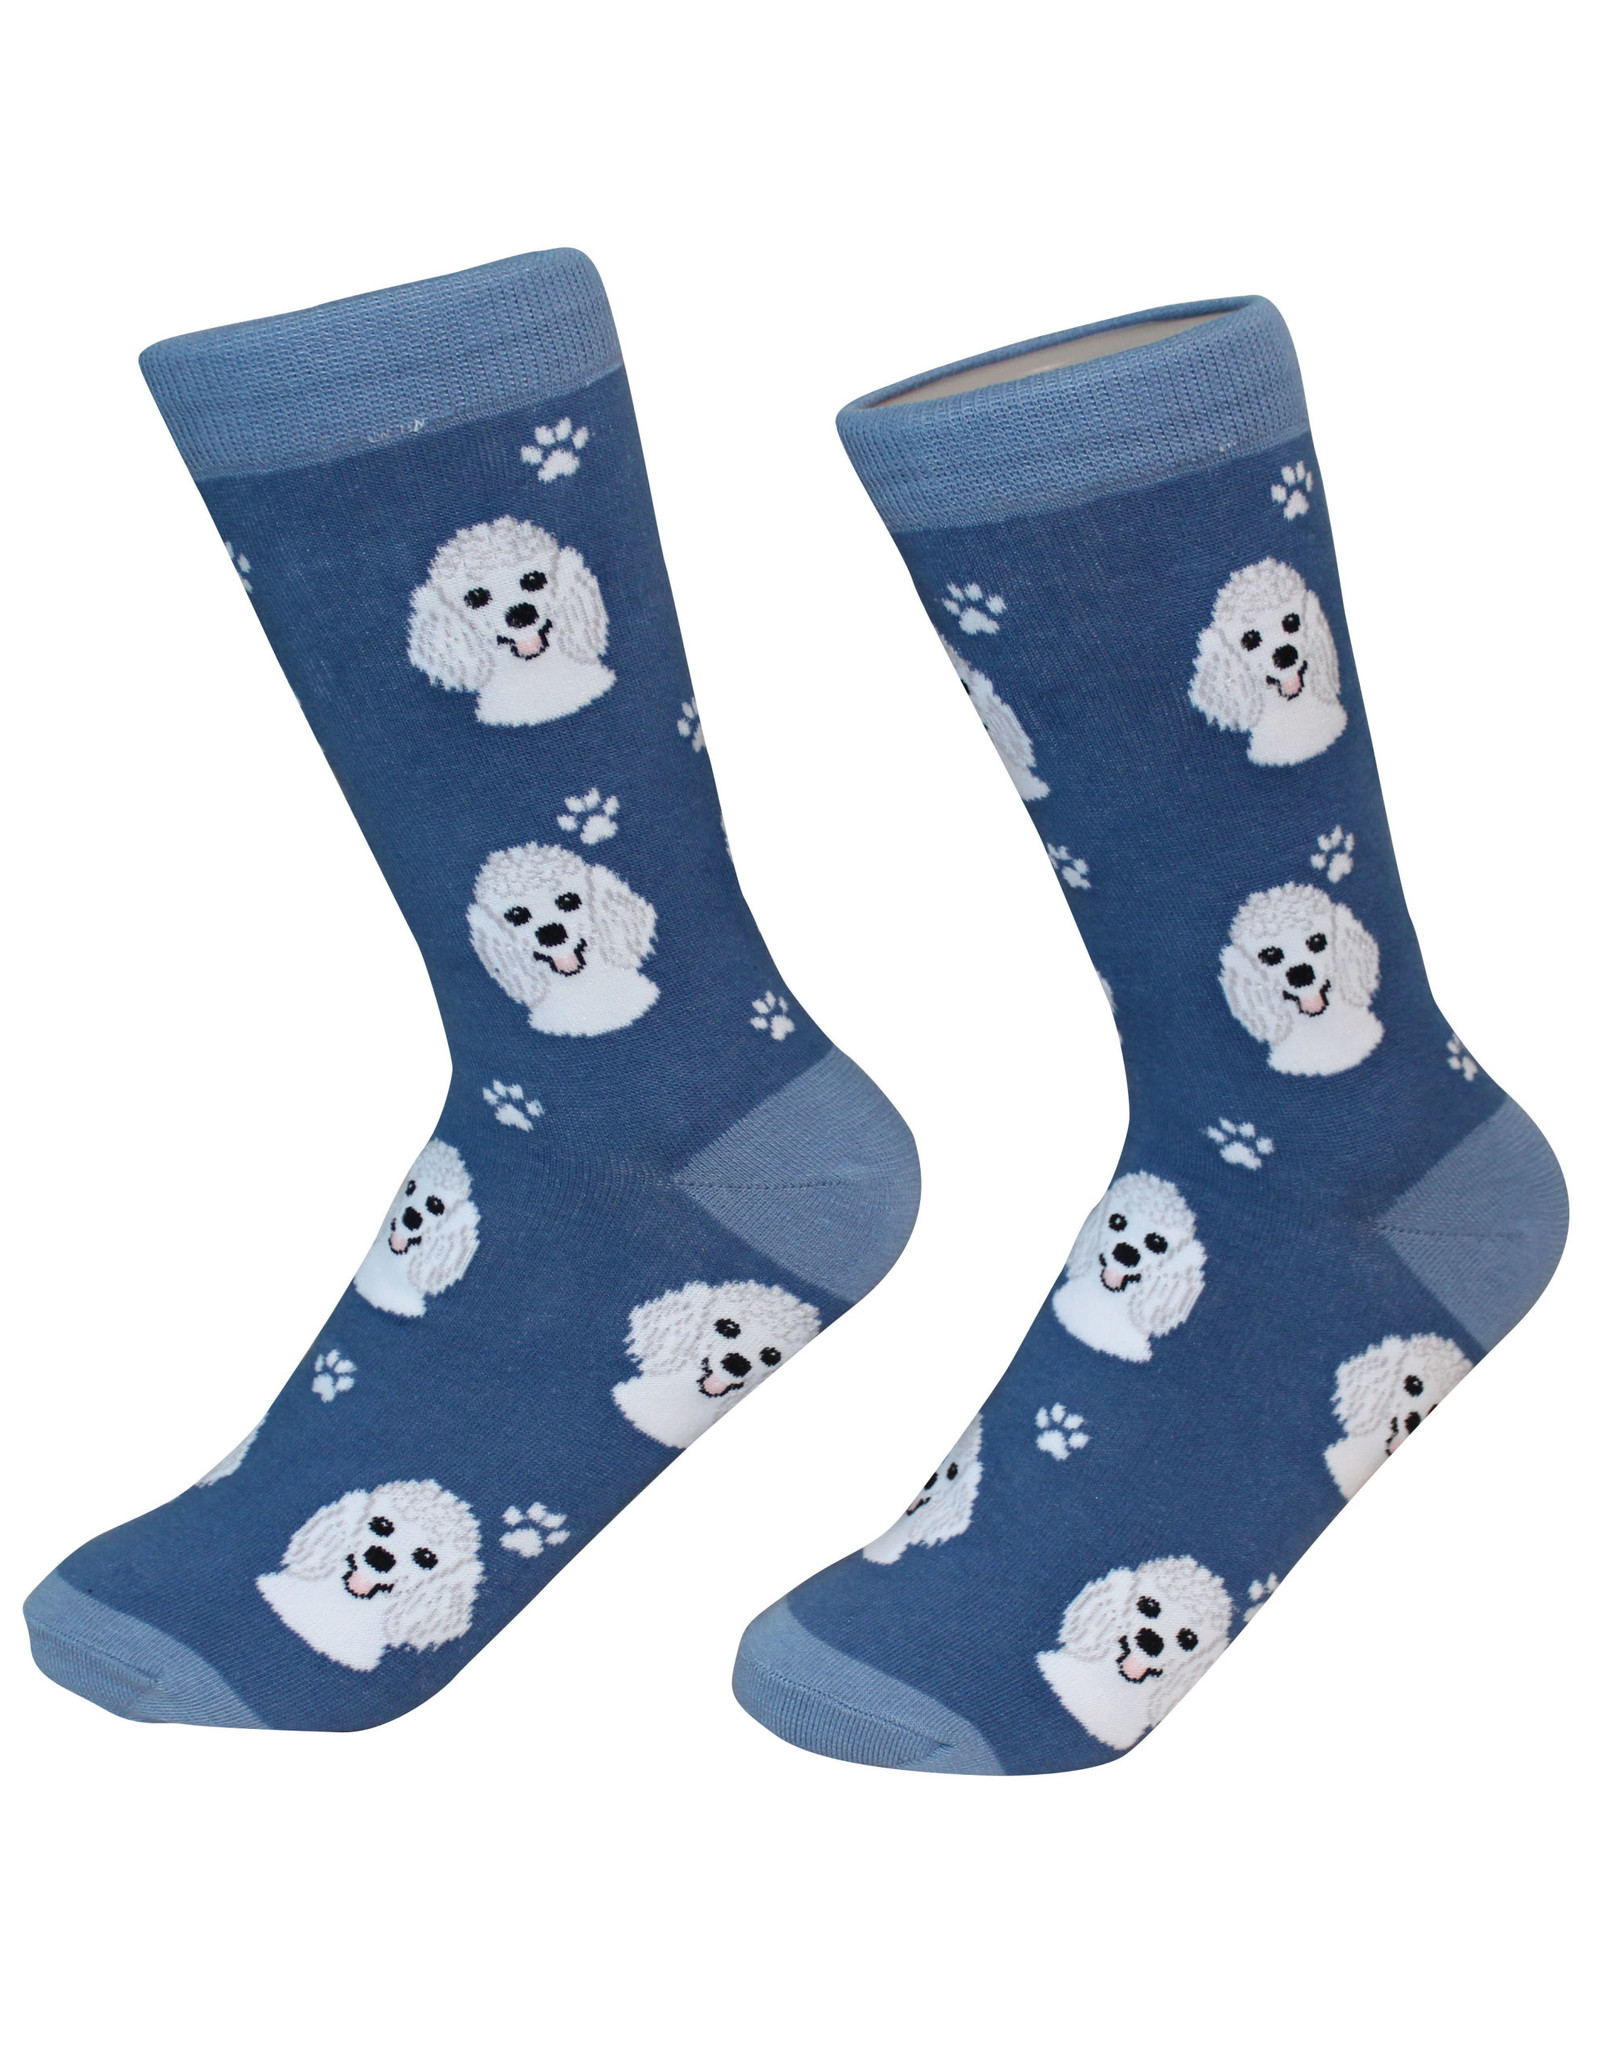 E&S Pets White Poodle Socks